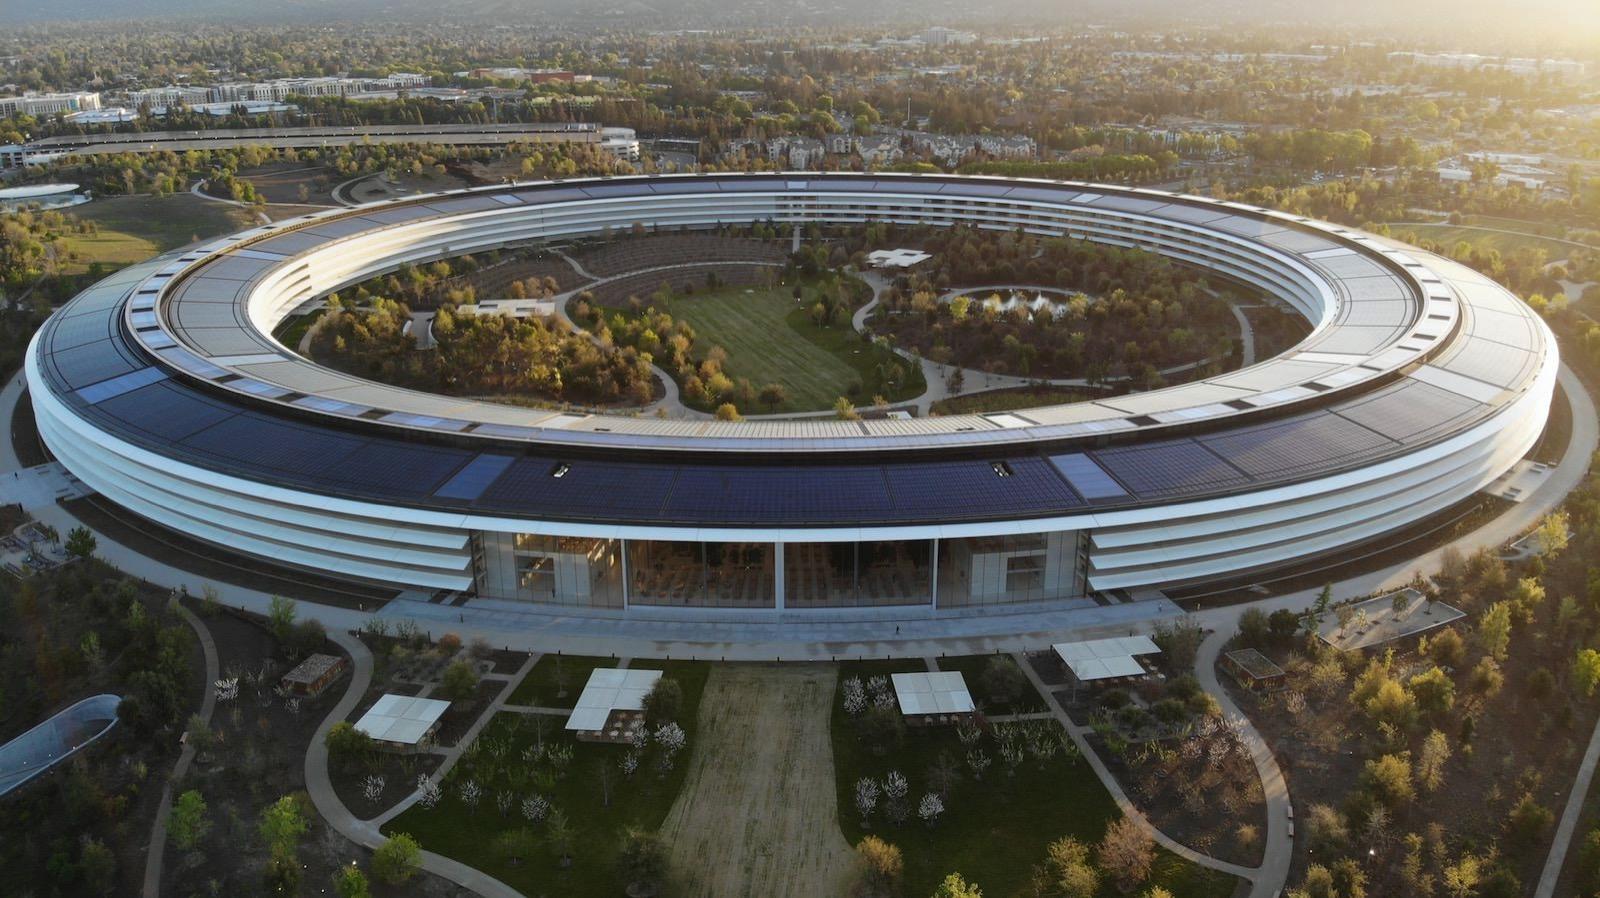 carles-rabada-635092-unsplash-Apple-Park-from-above.jpg